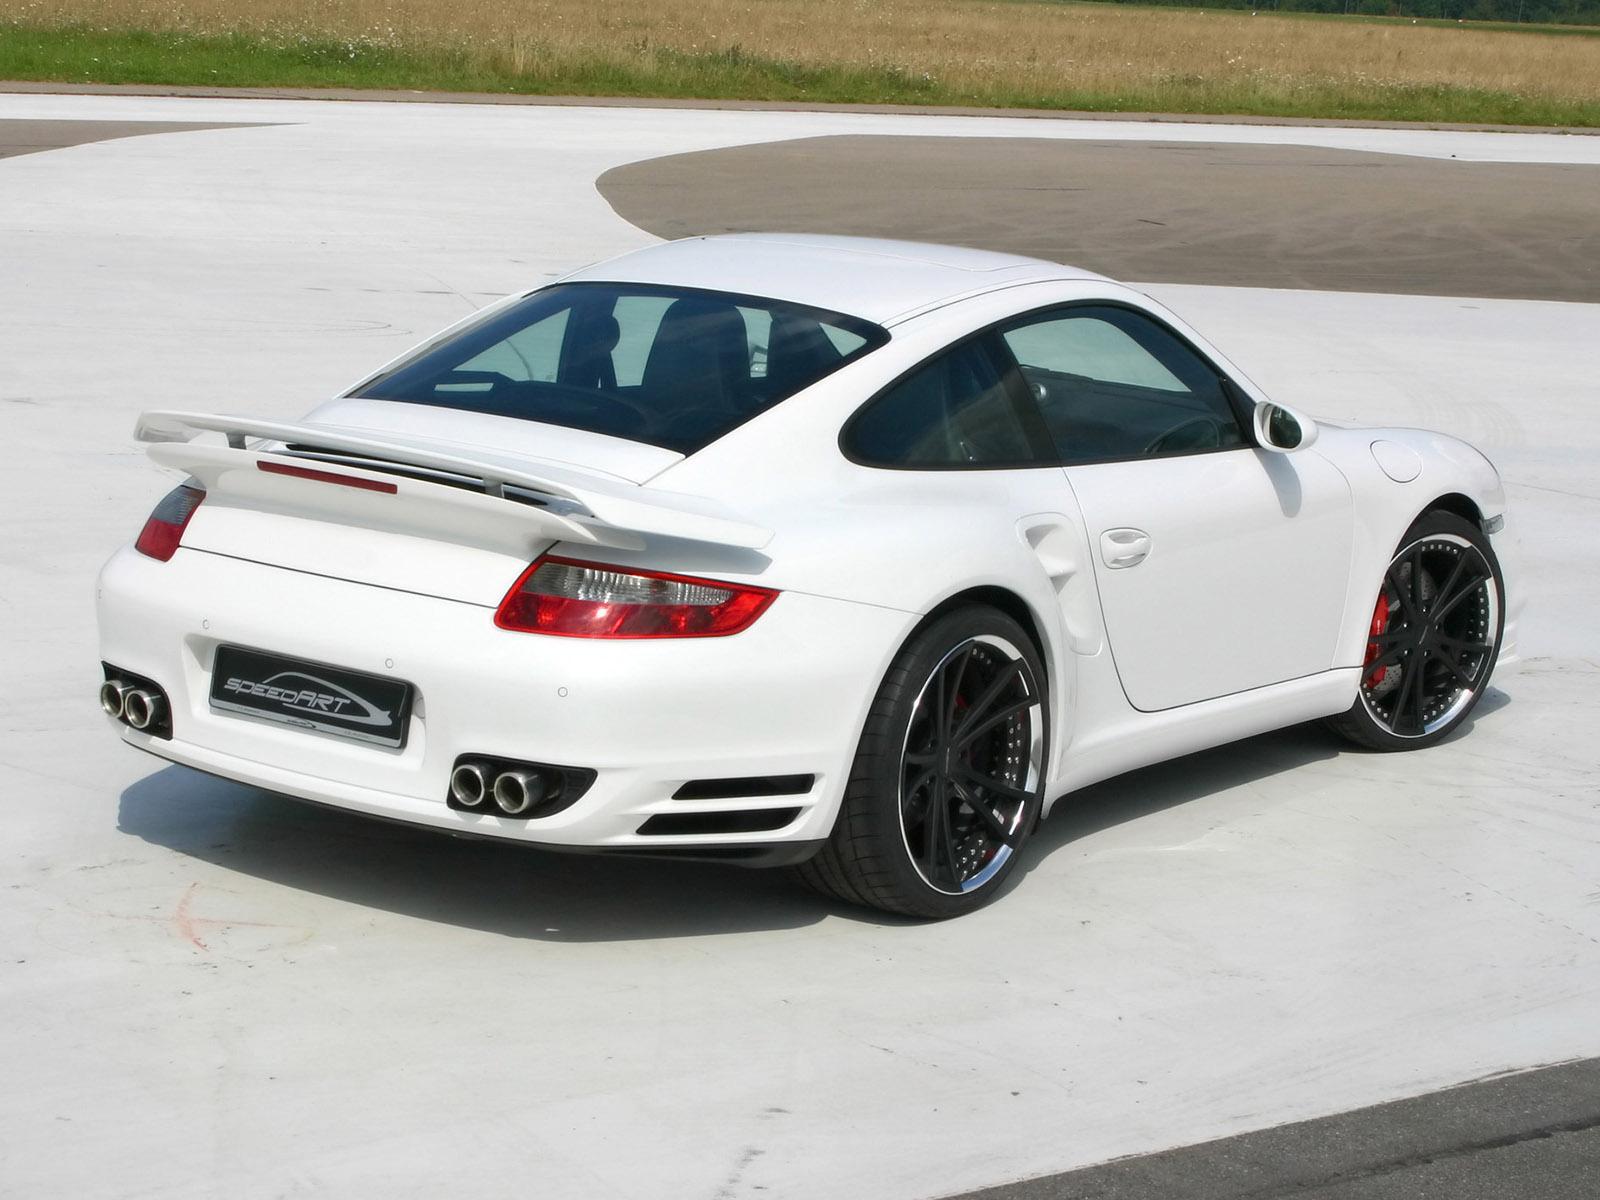 2009 Speedart Porsche 911 Turbo BTR 630